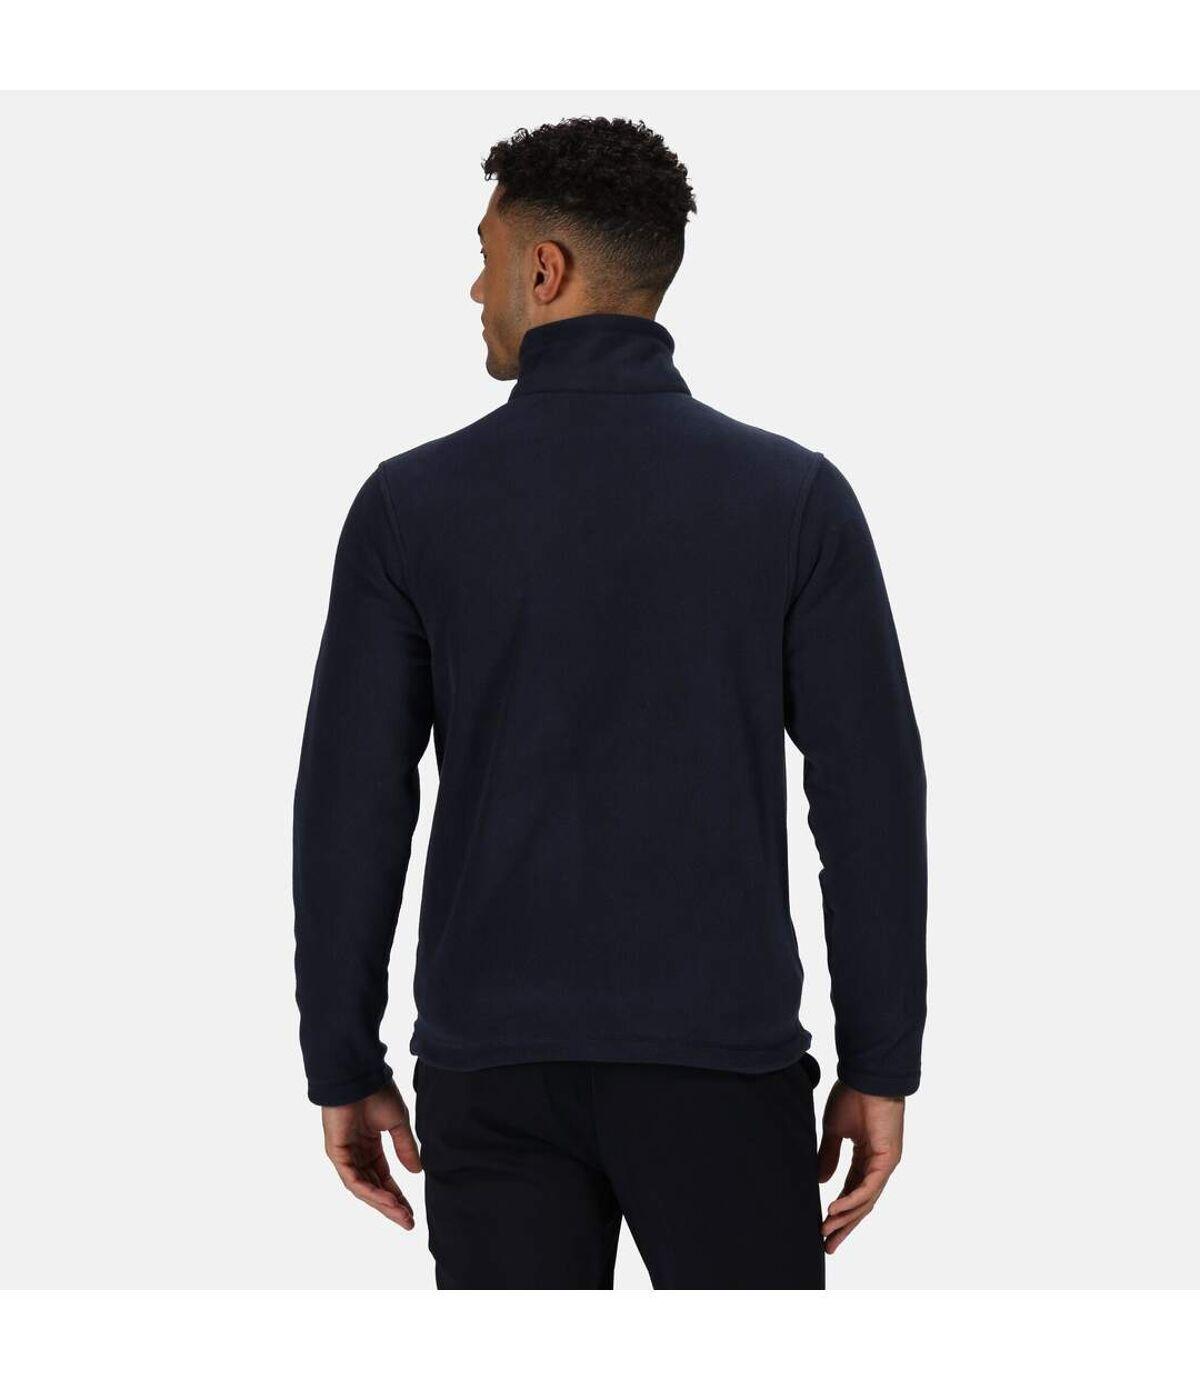 Regatta - Veste polaire - Homme (Bleu marine) - UTRG1551